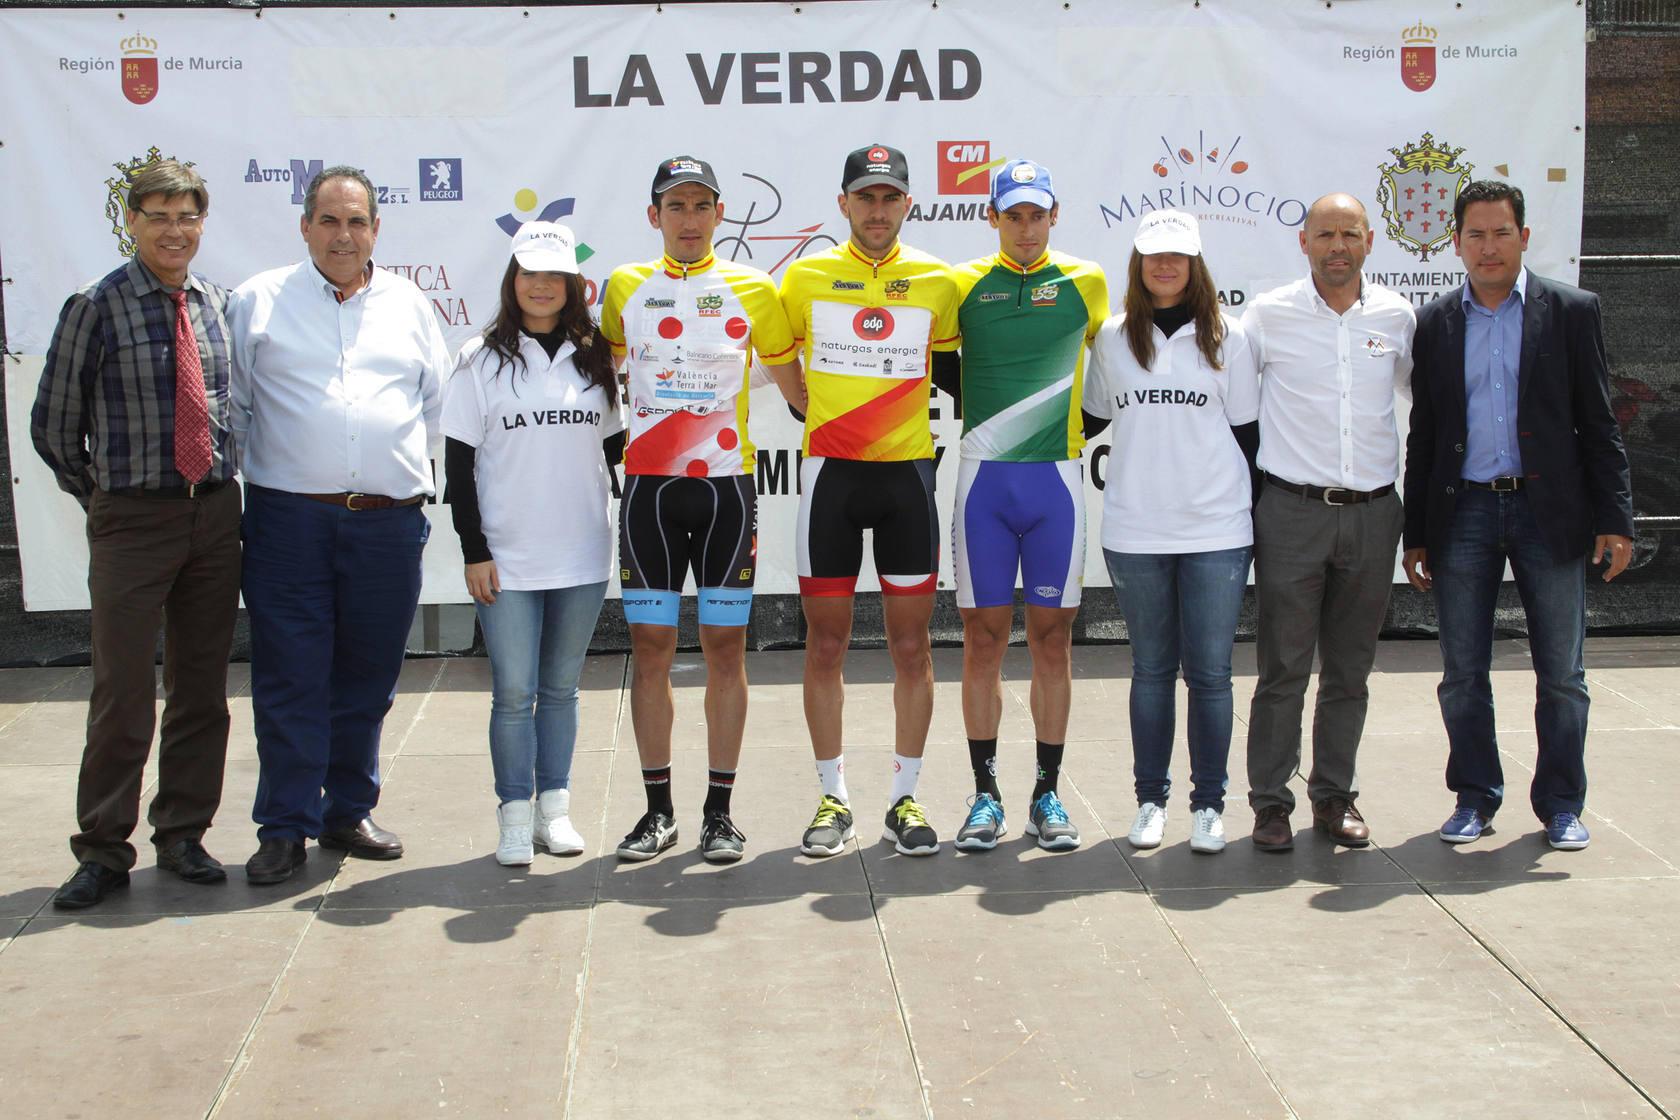 La fiesta del ciclismo toma Alcantarilla